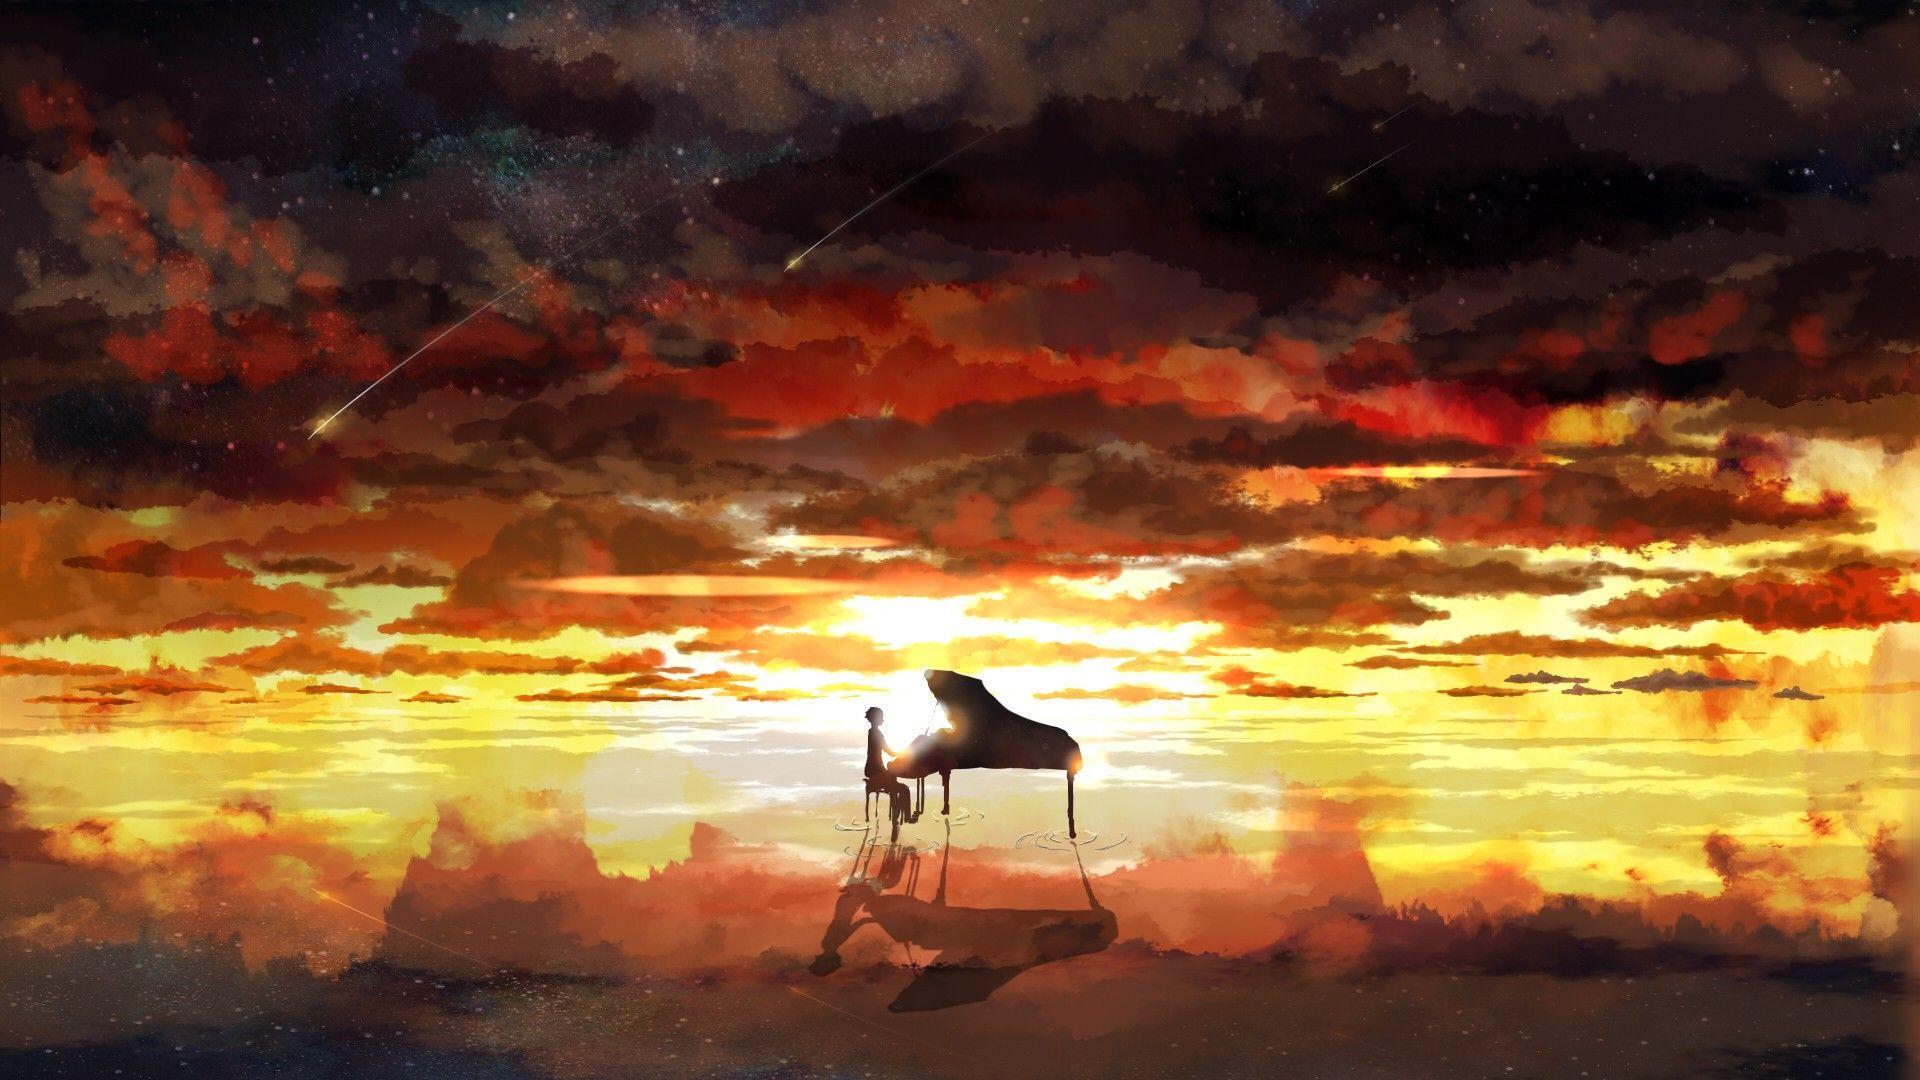 1920x1080 Piano Rising Sun Anime hình nền